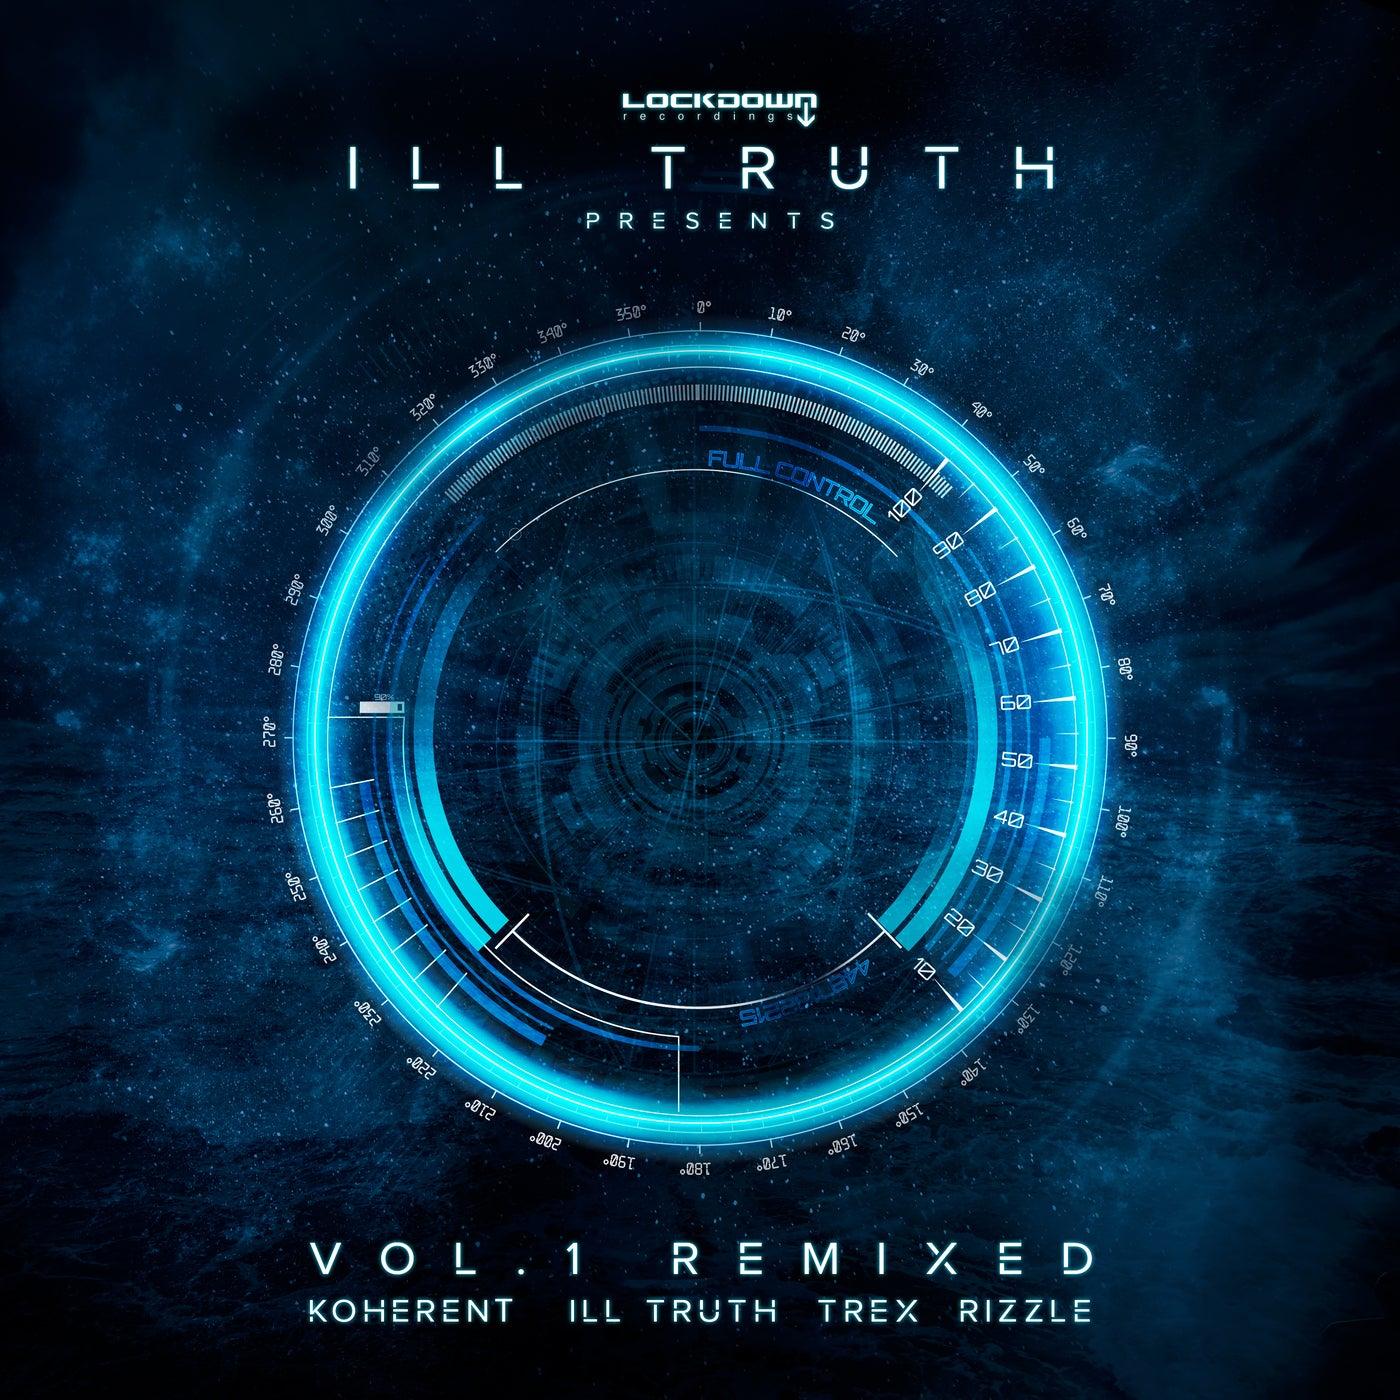 Futile (Koherent Remix)